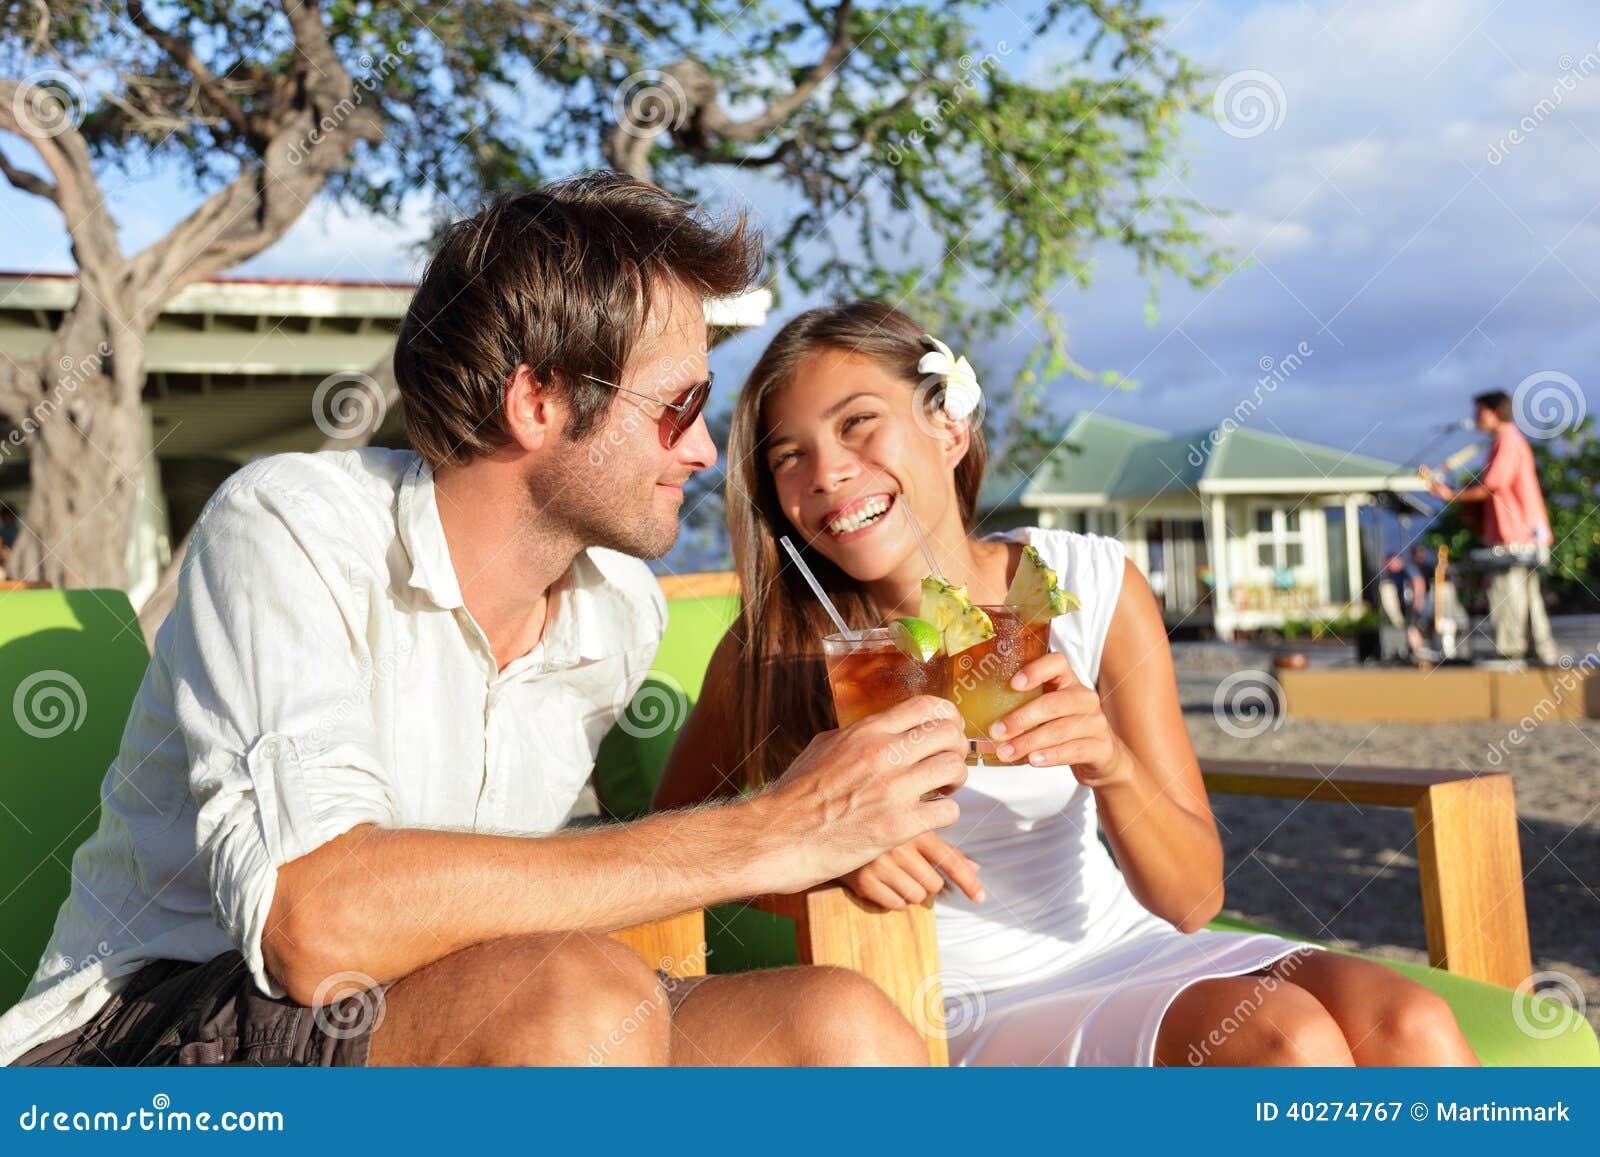 free black white dating sites